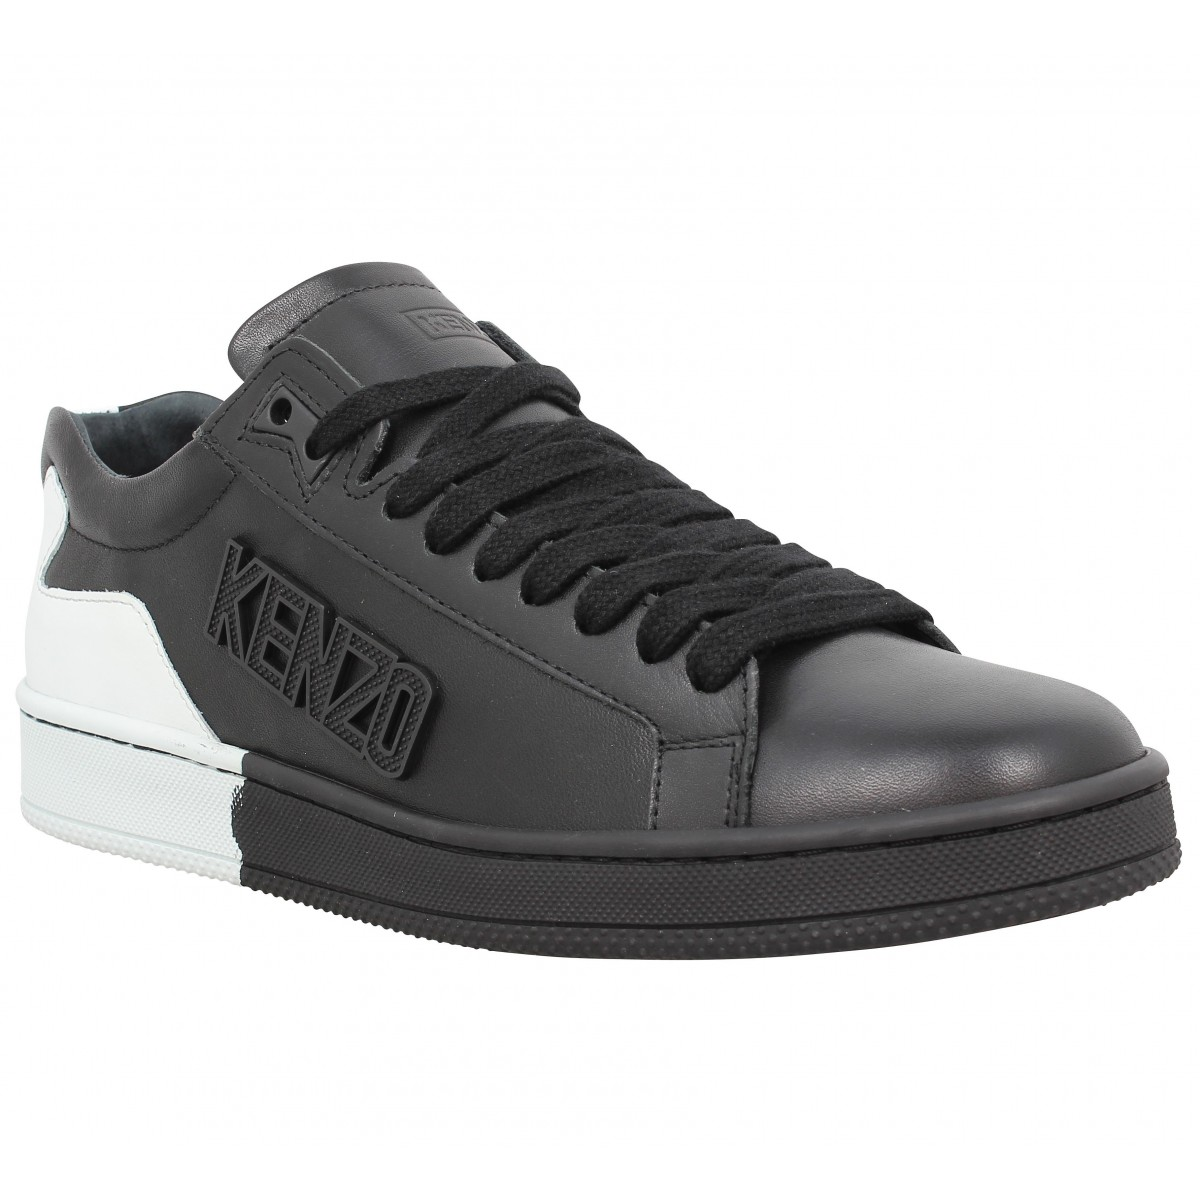 soldes kenzo tennix bicolore cuir homme noir homme fanny chaussures. Black Bedroom Furniture Sets. Home Design Ideas